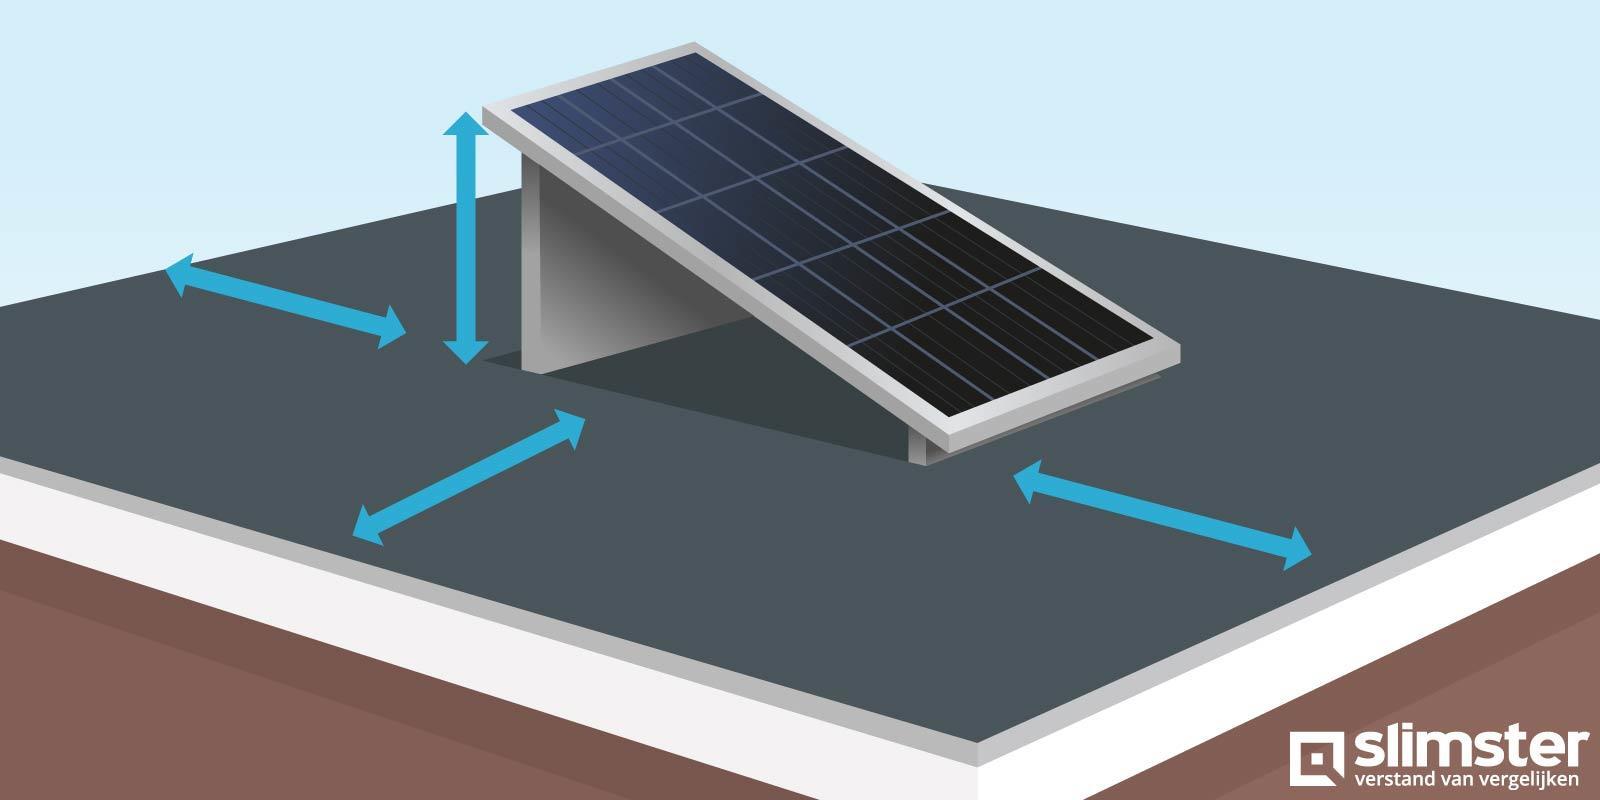 vergunningsvrij zonnepanelen plat dak